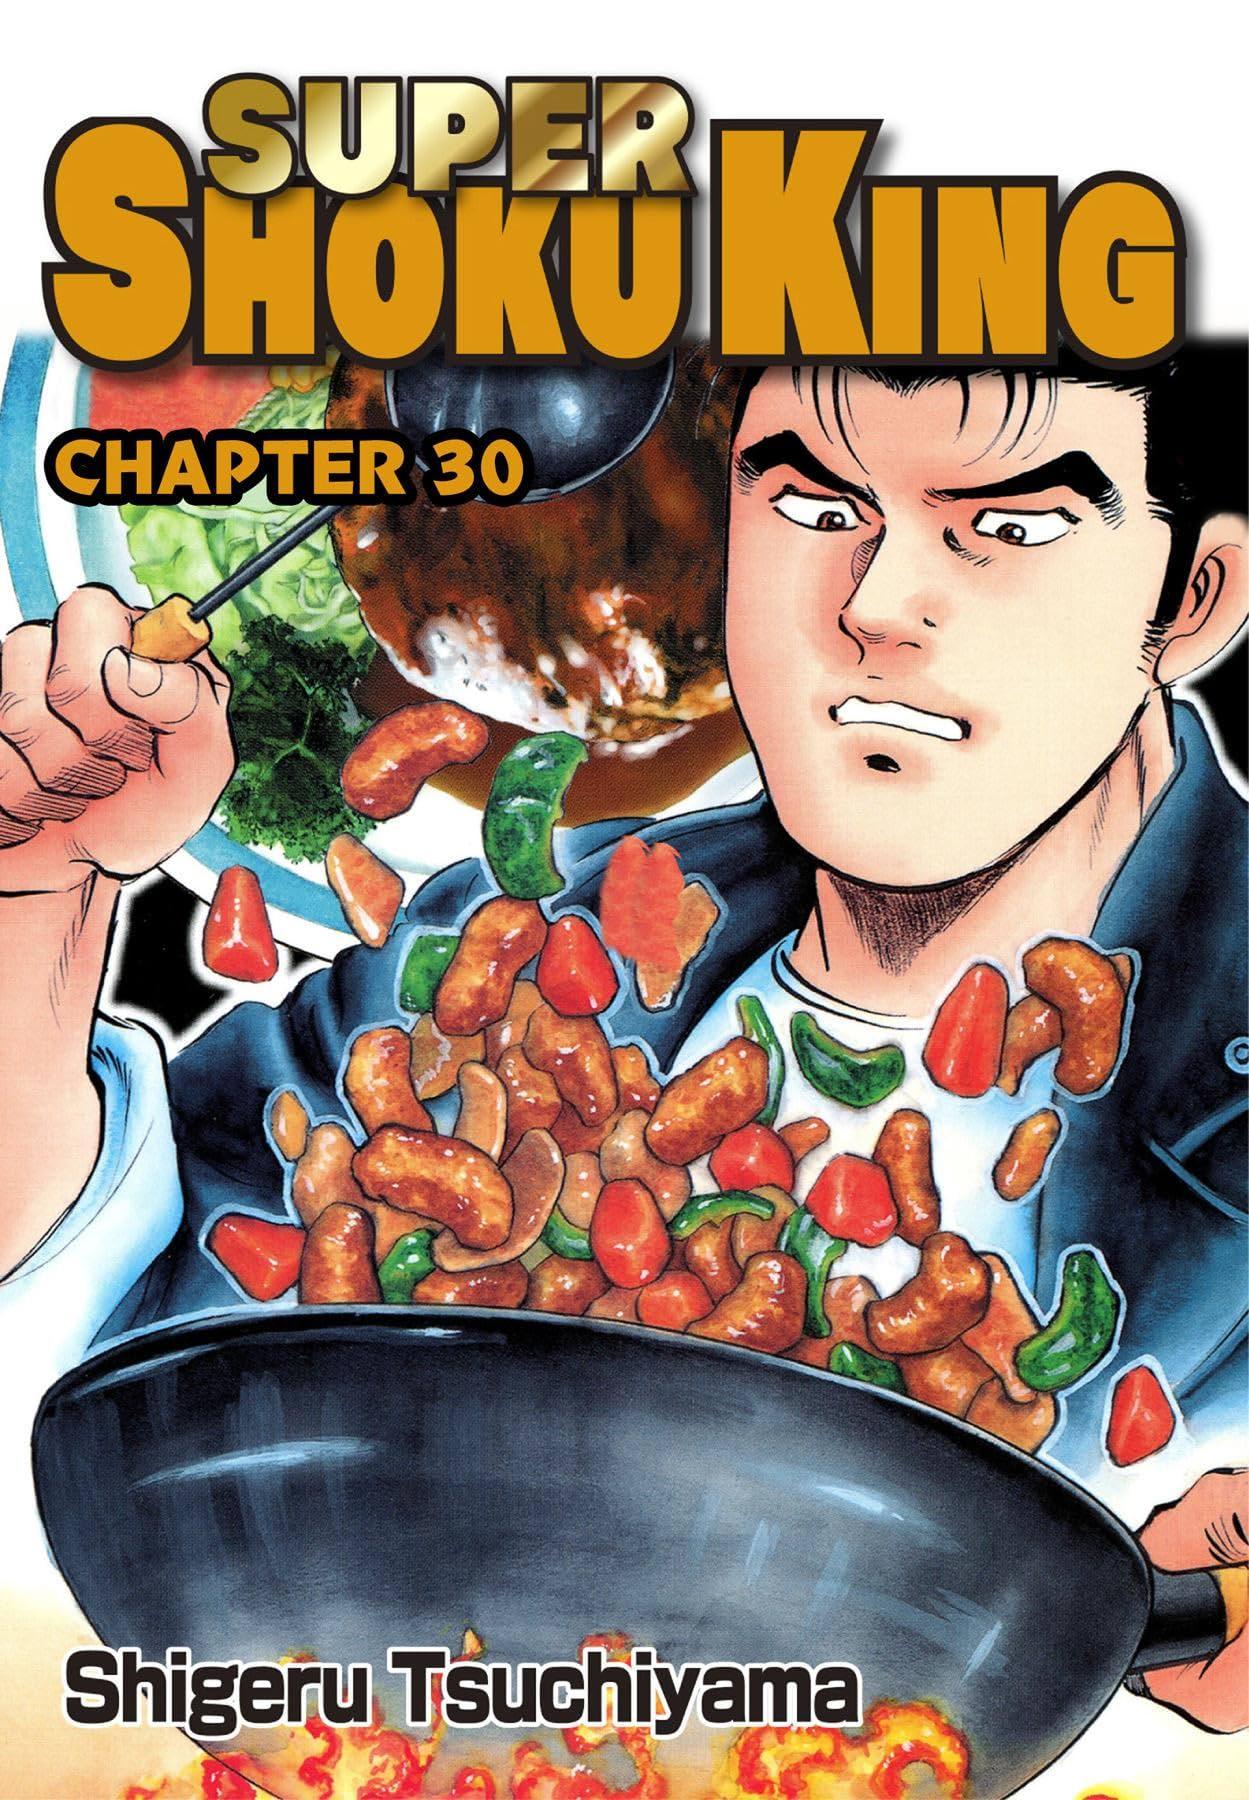 SUPER SHOKU KING #30